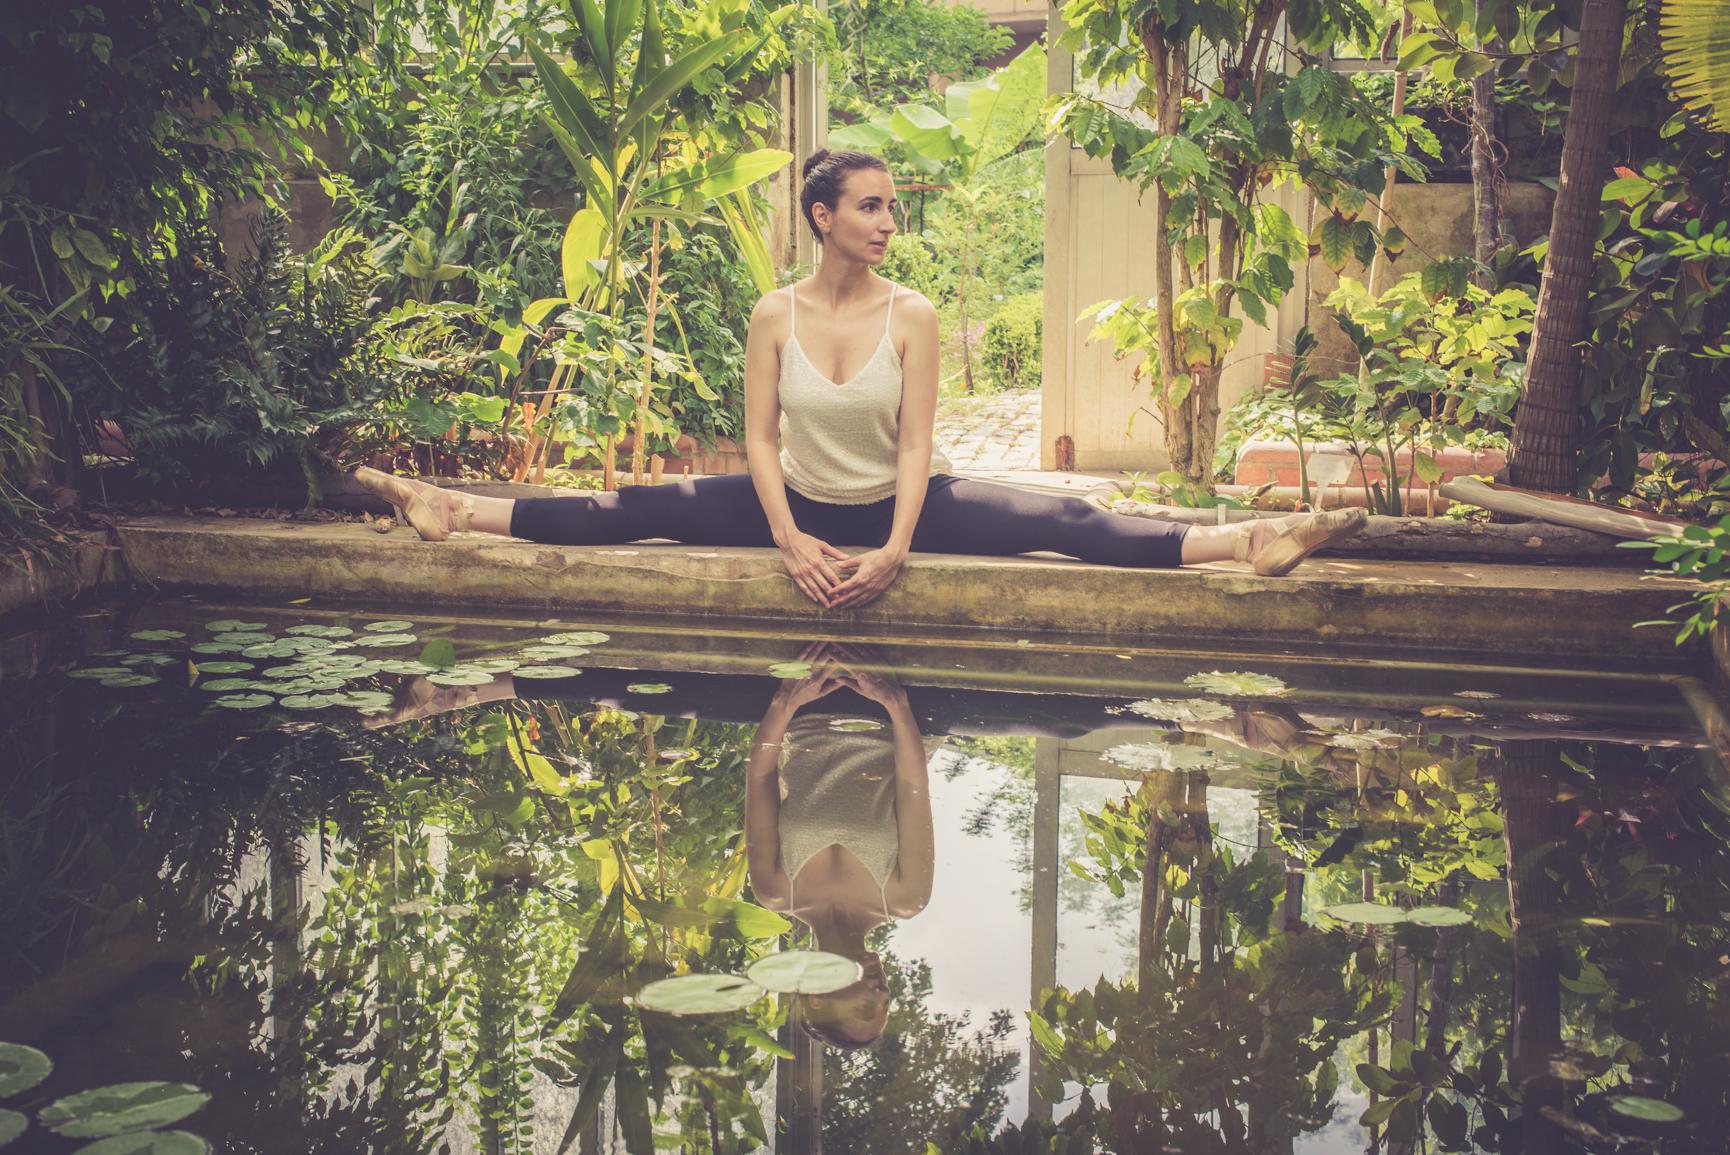 Caro_Ballerina-305.jpg